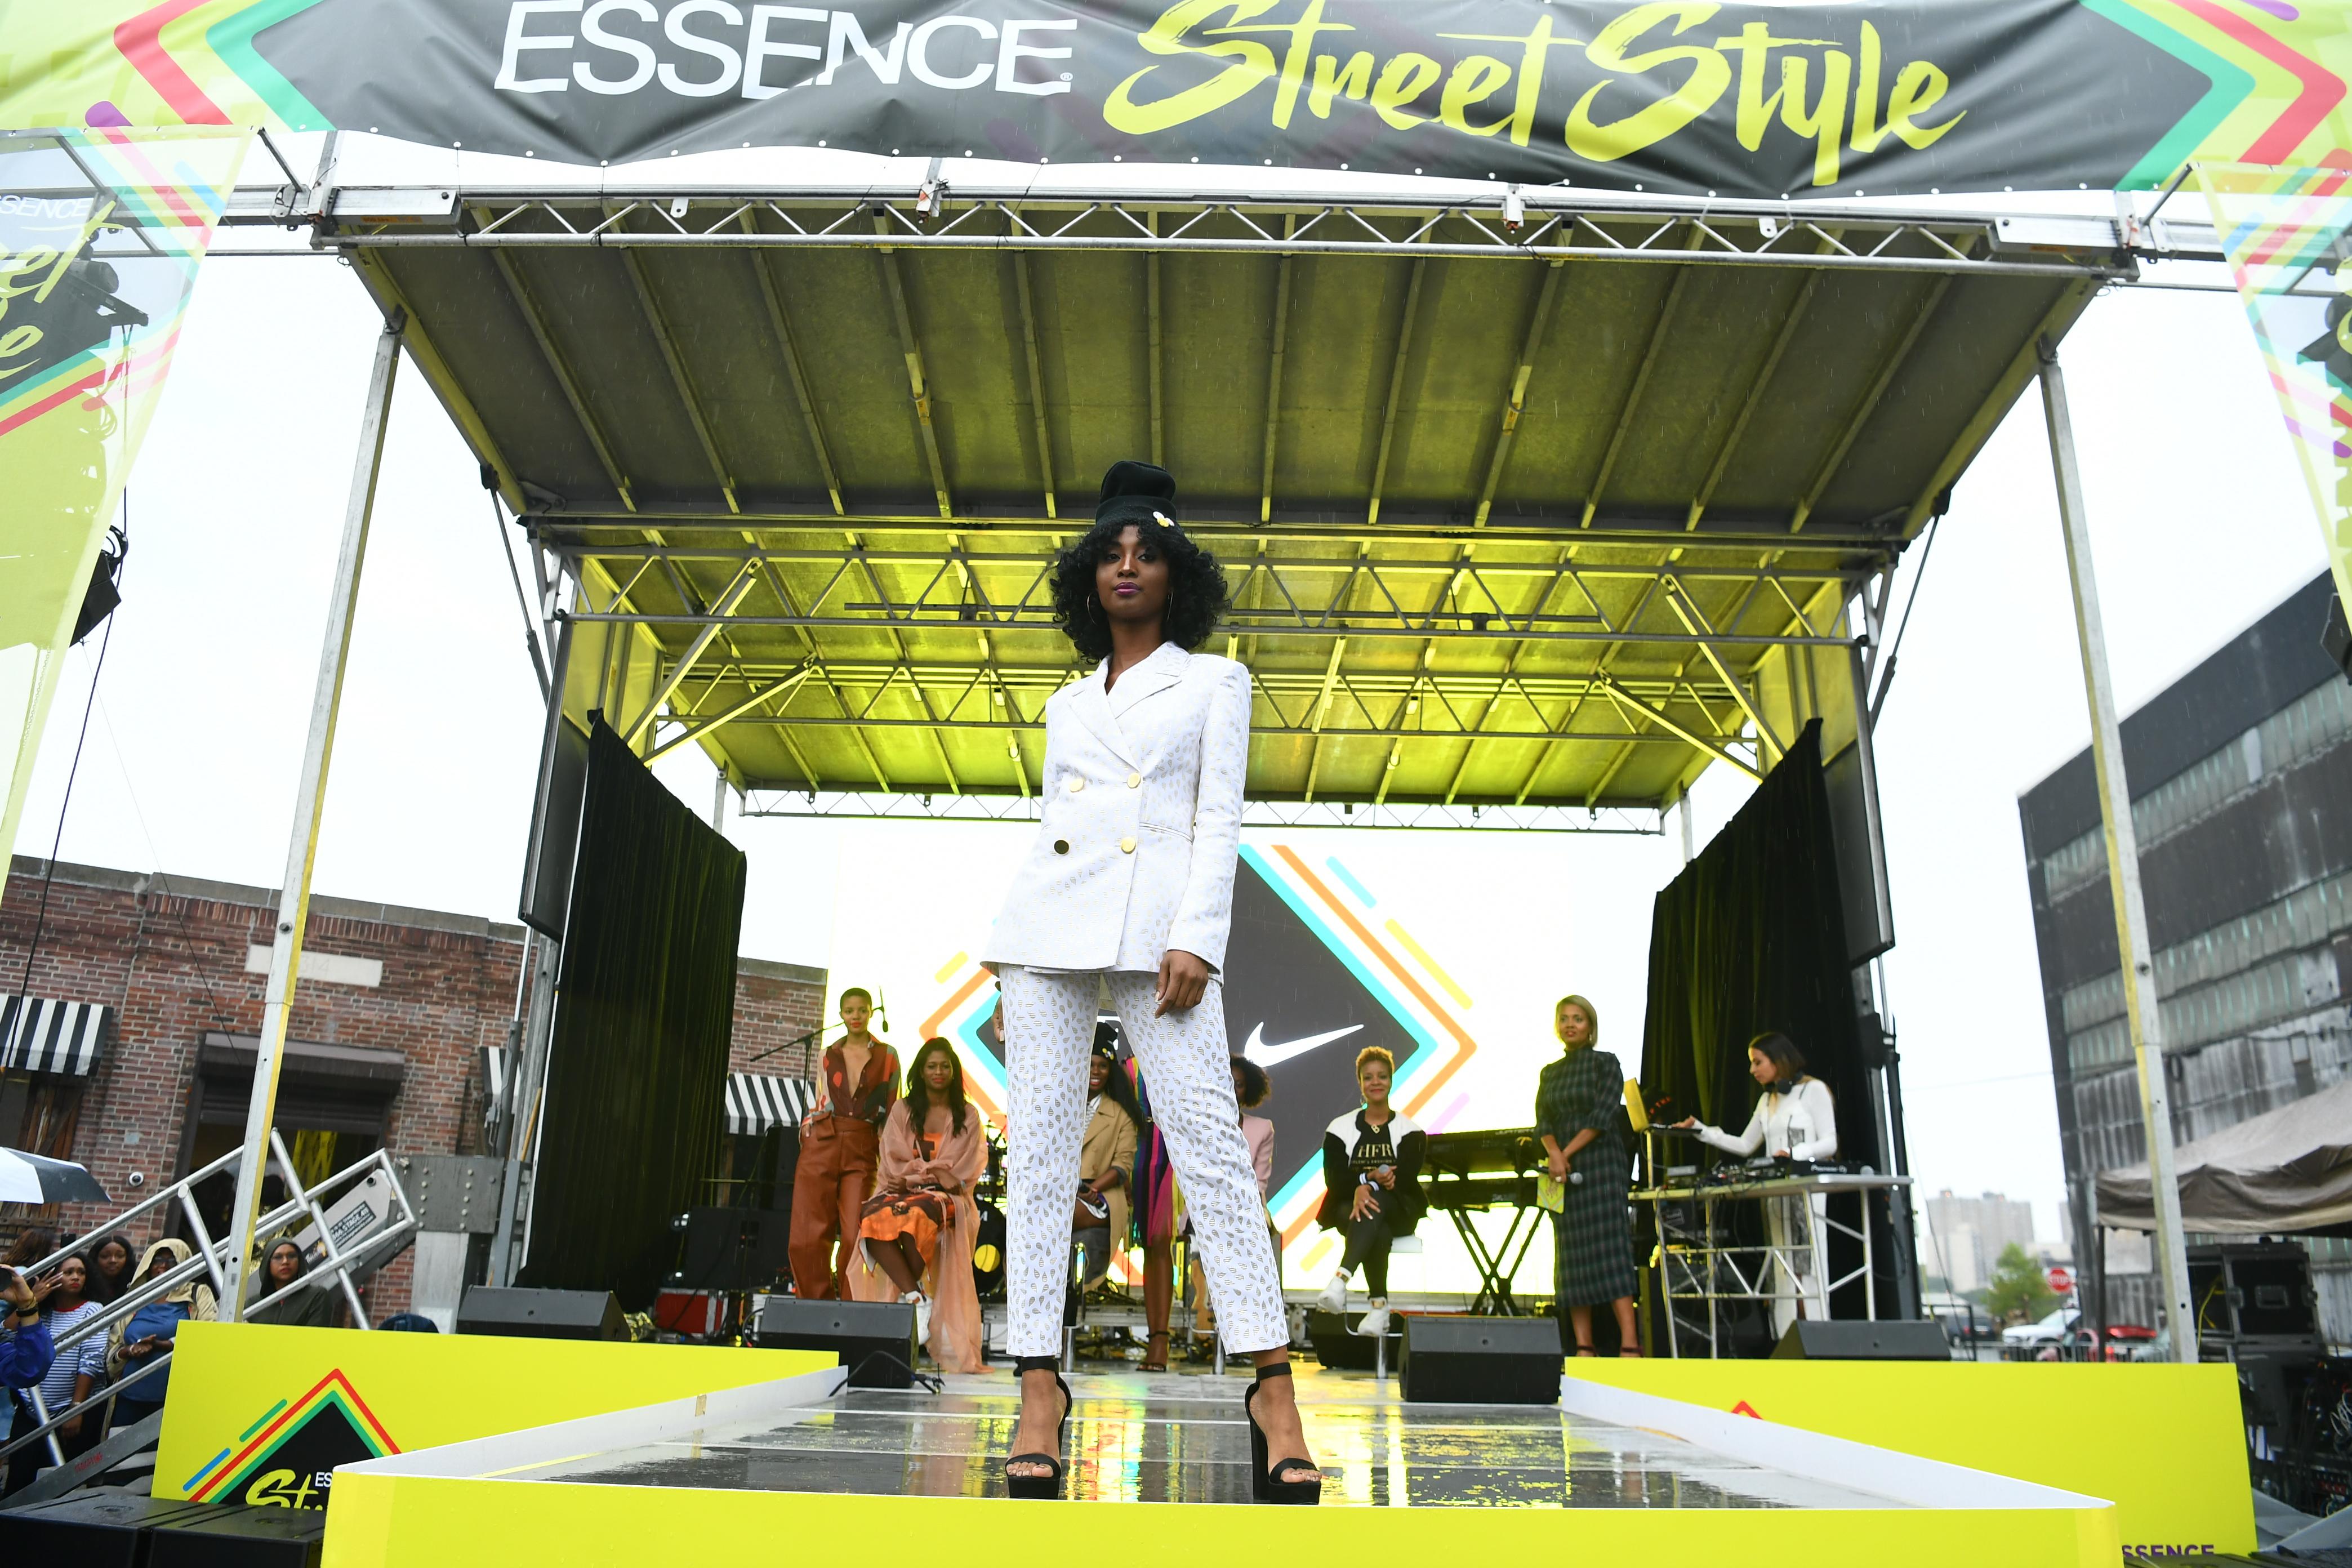 2018 Essence Street Style Festival